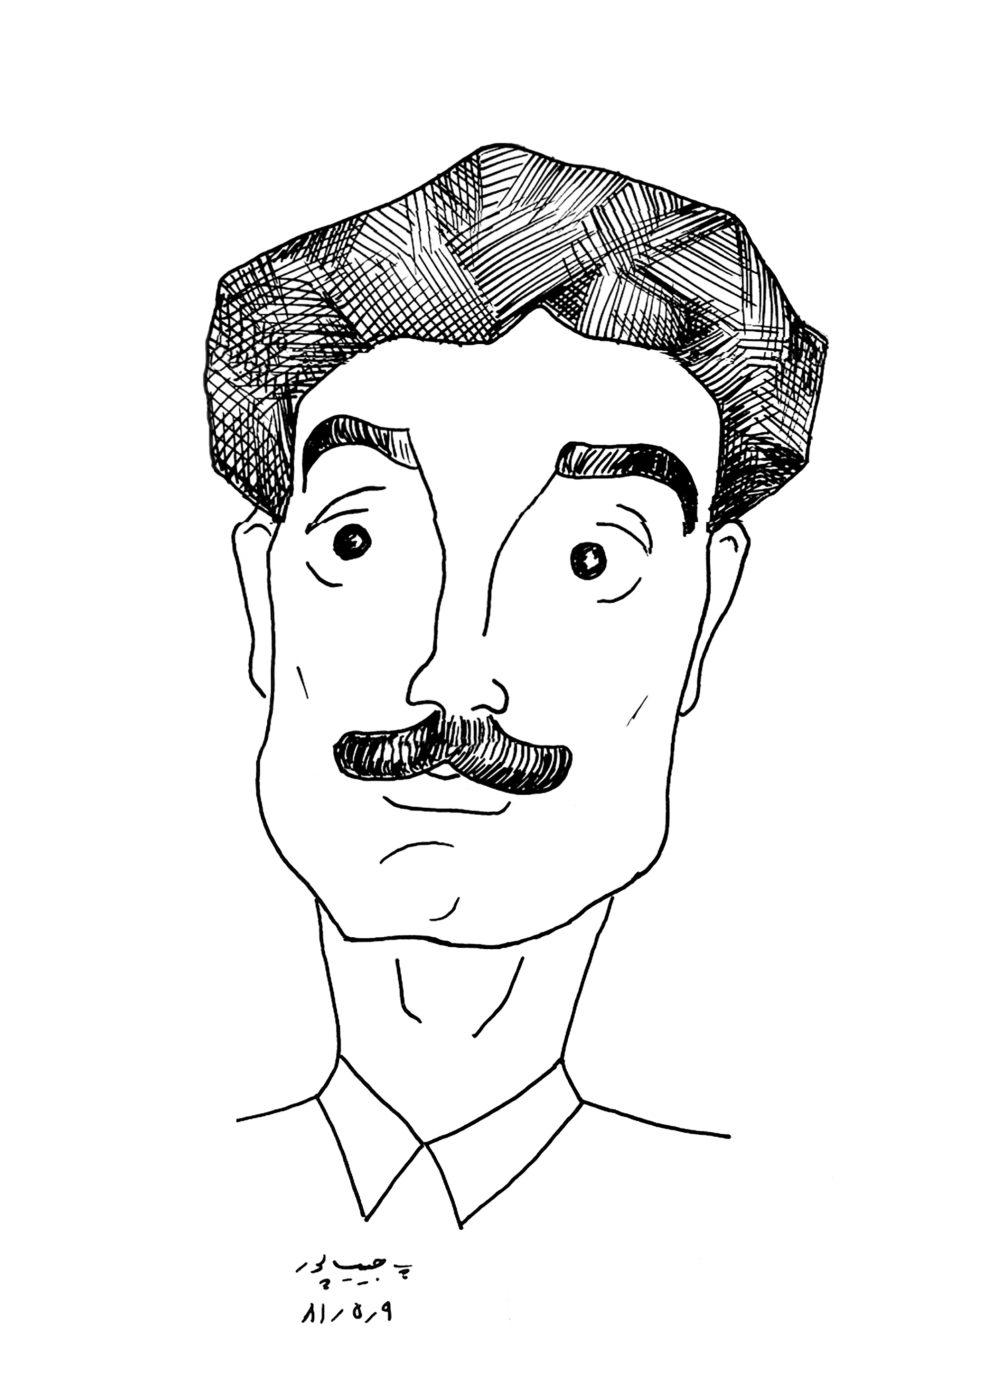 کاریکاتور رضا ترابی اثر استاد پرویز حبیب پور